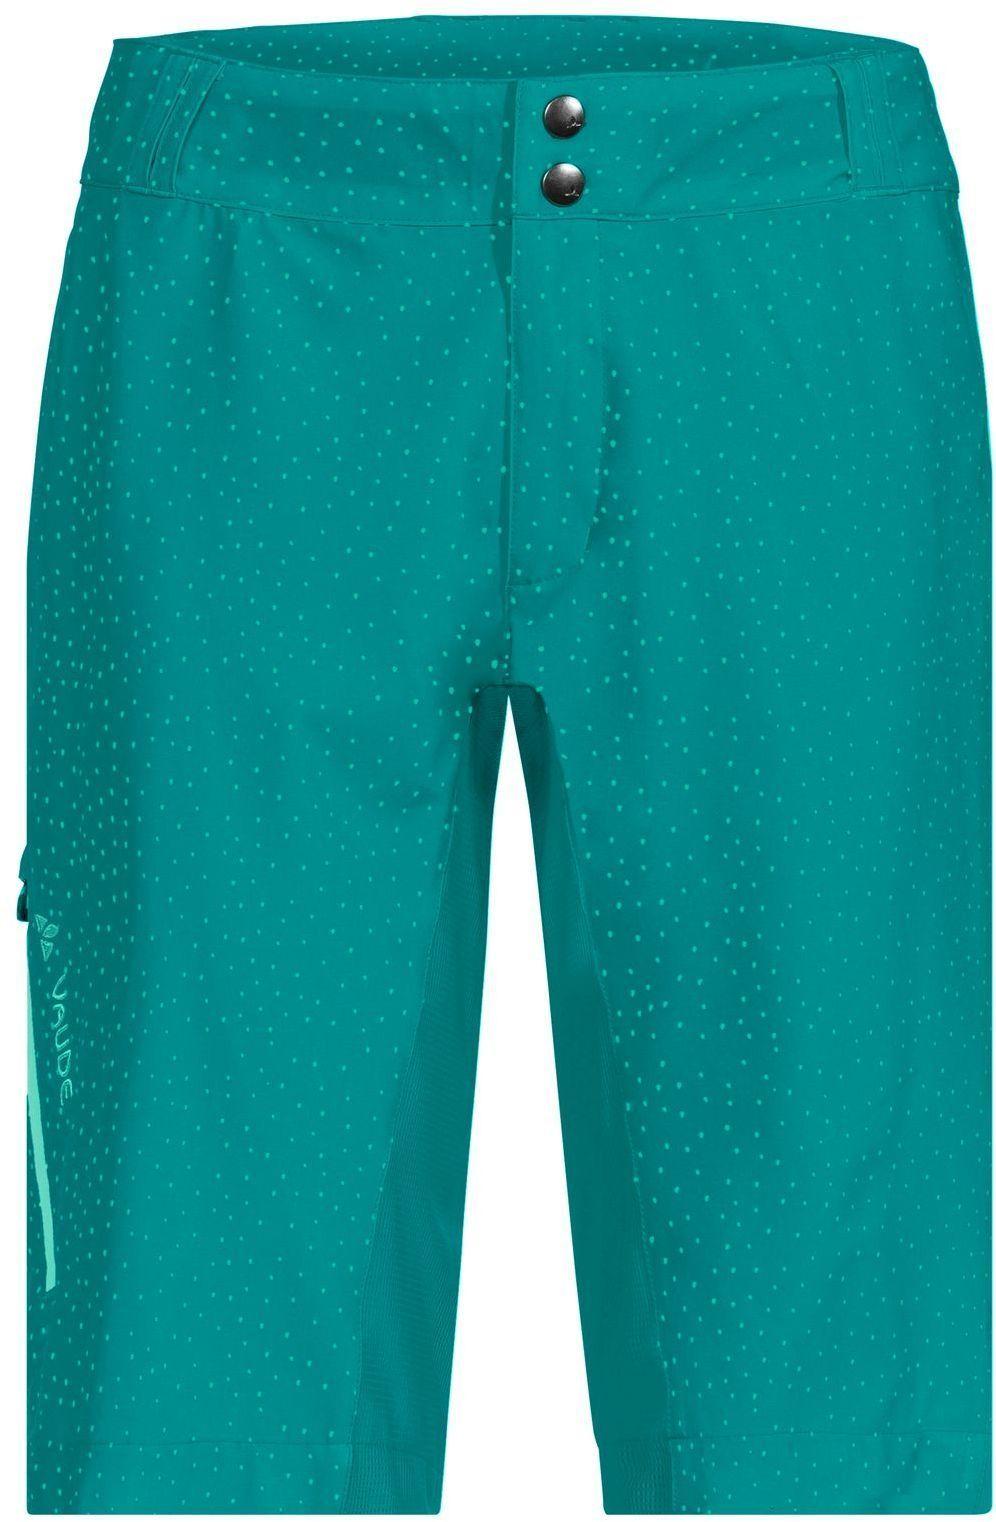 Vaude Women's Ligure Shorts - riviera XXS